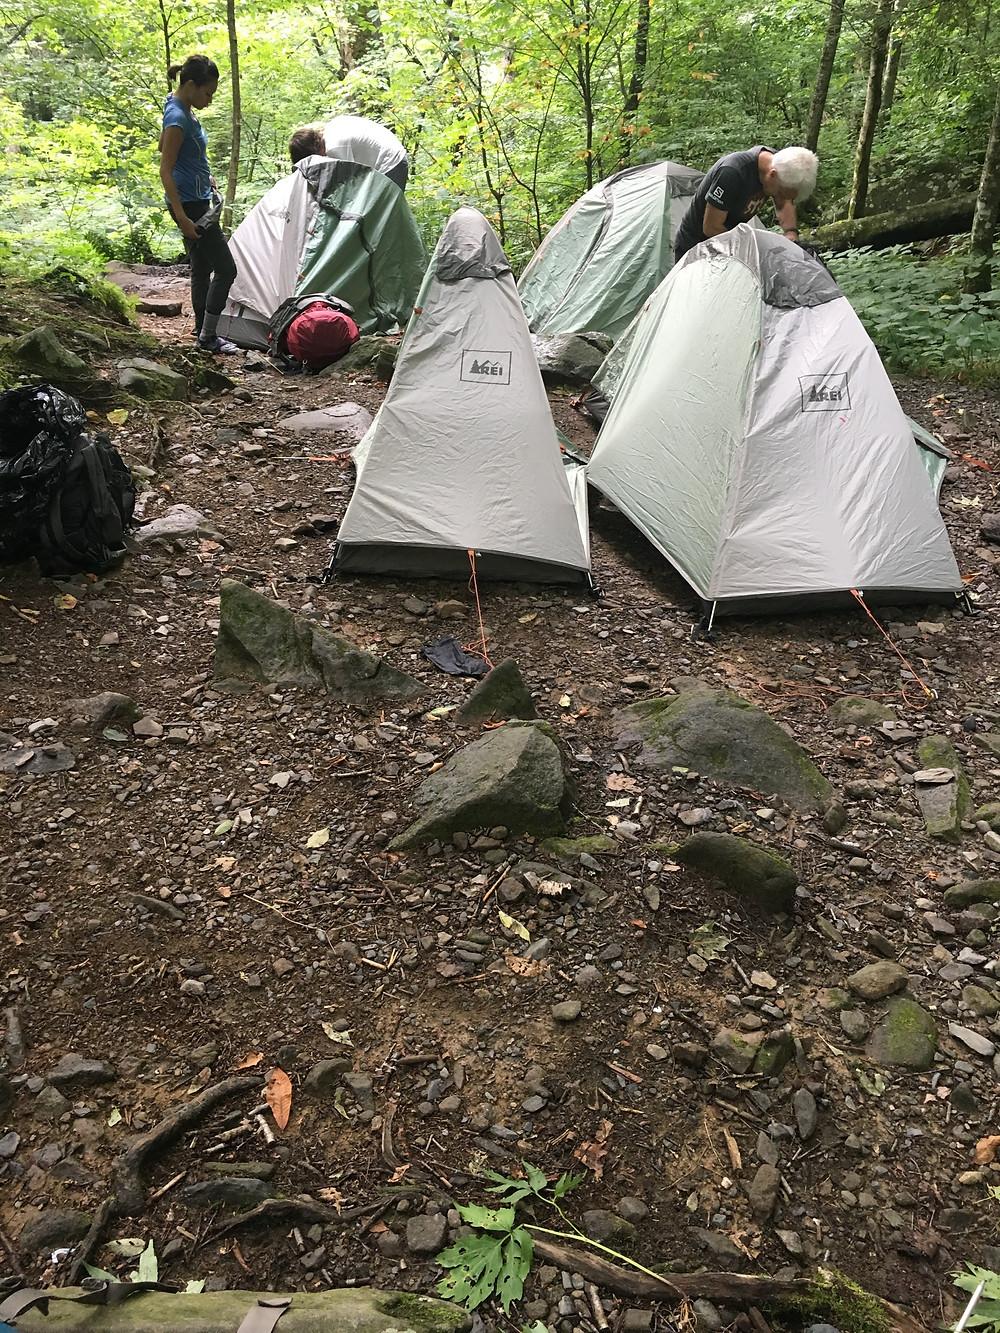 Single person tents are small